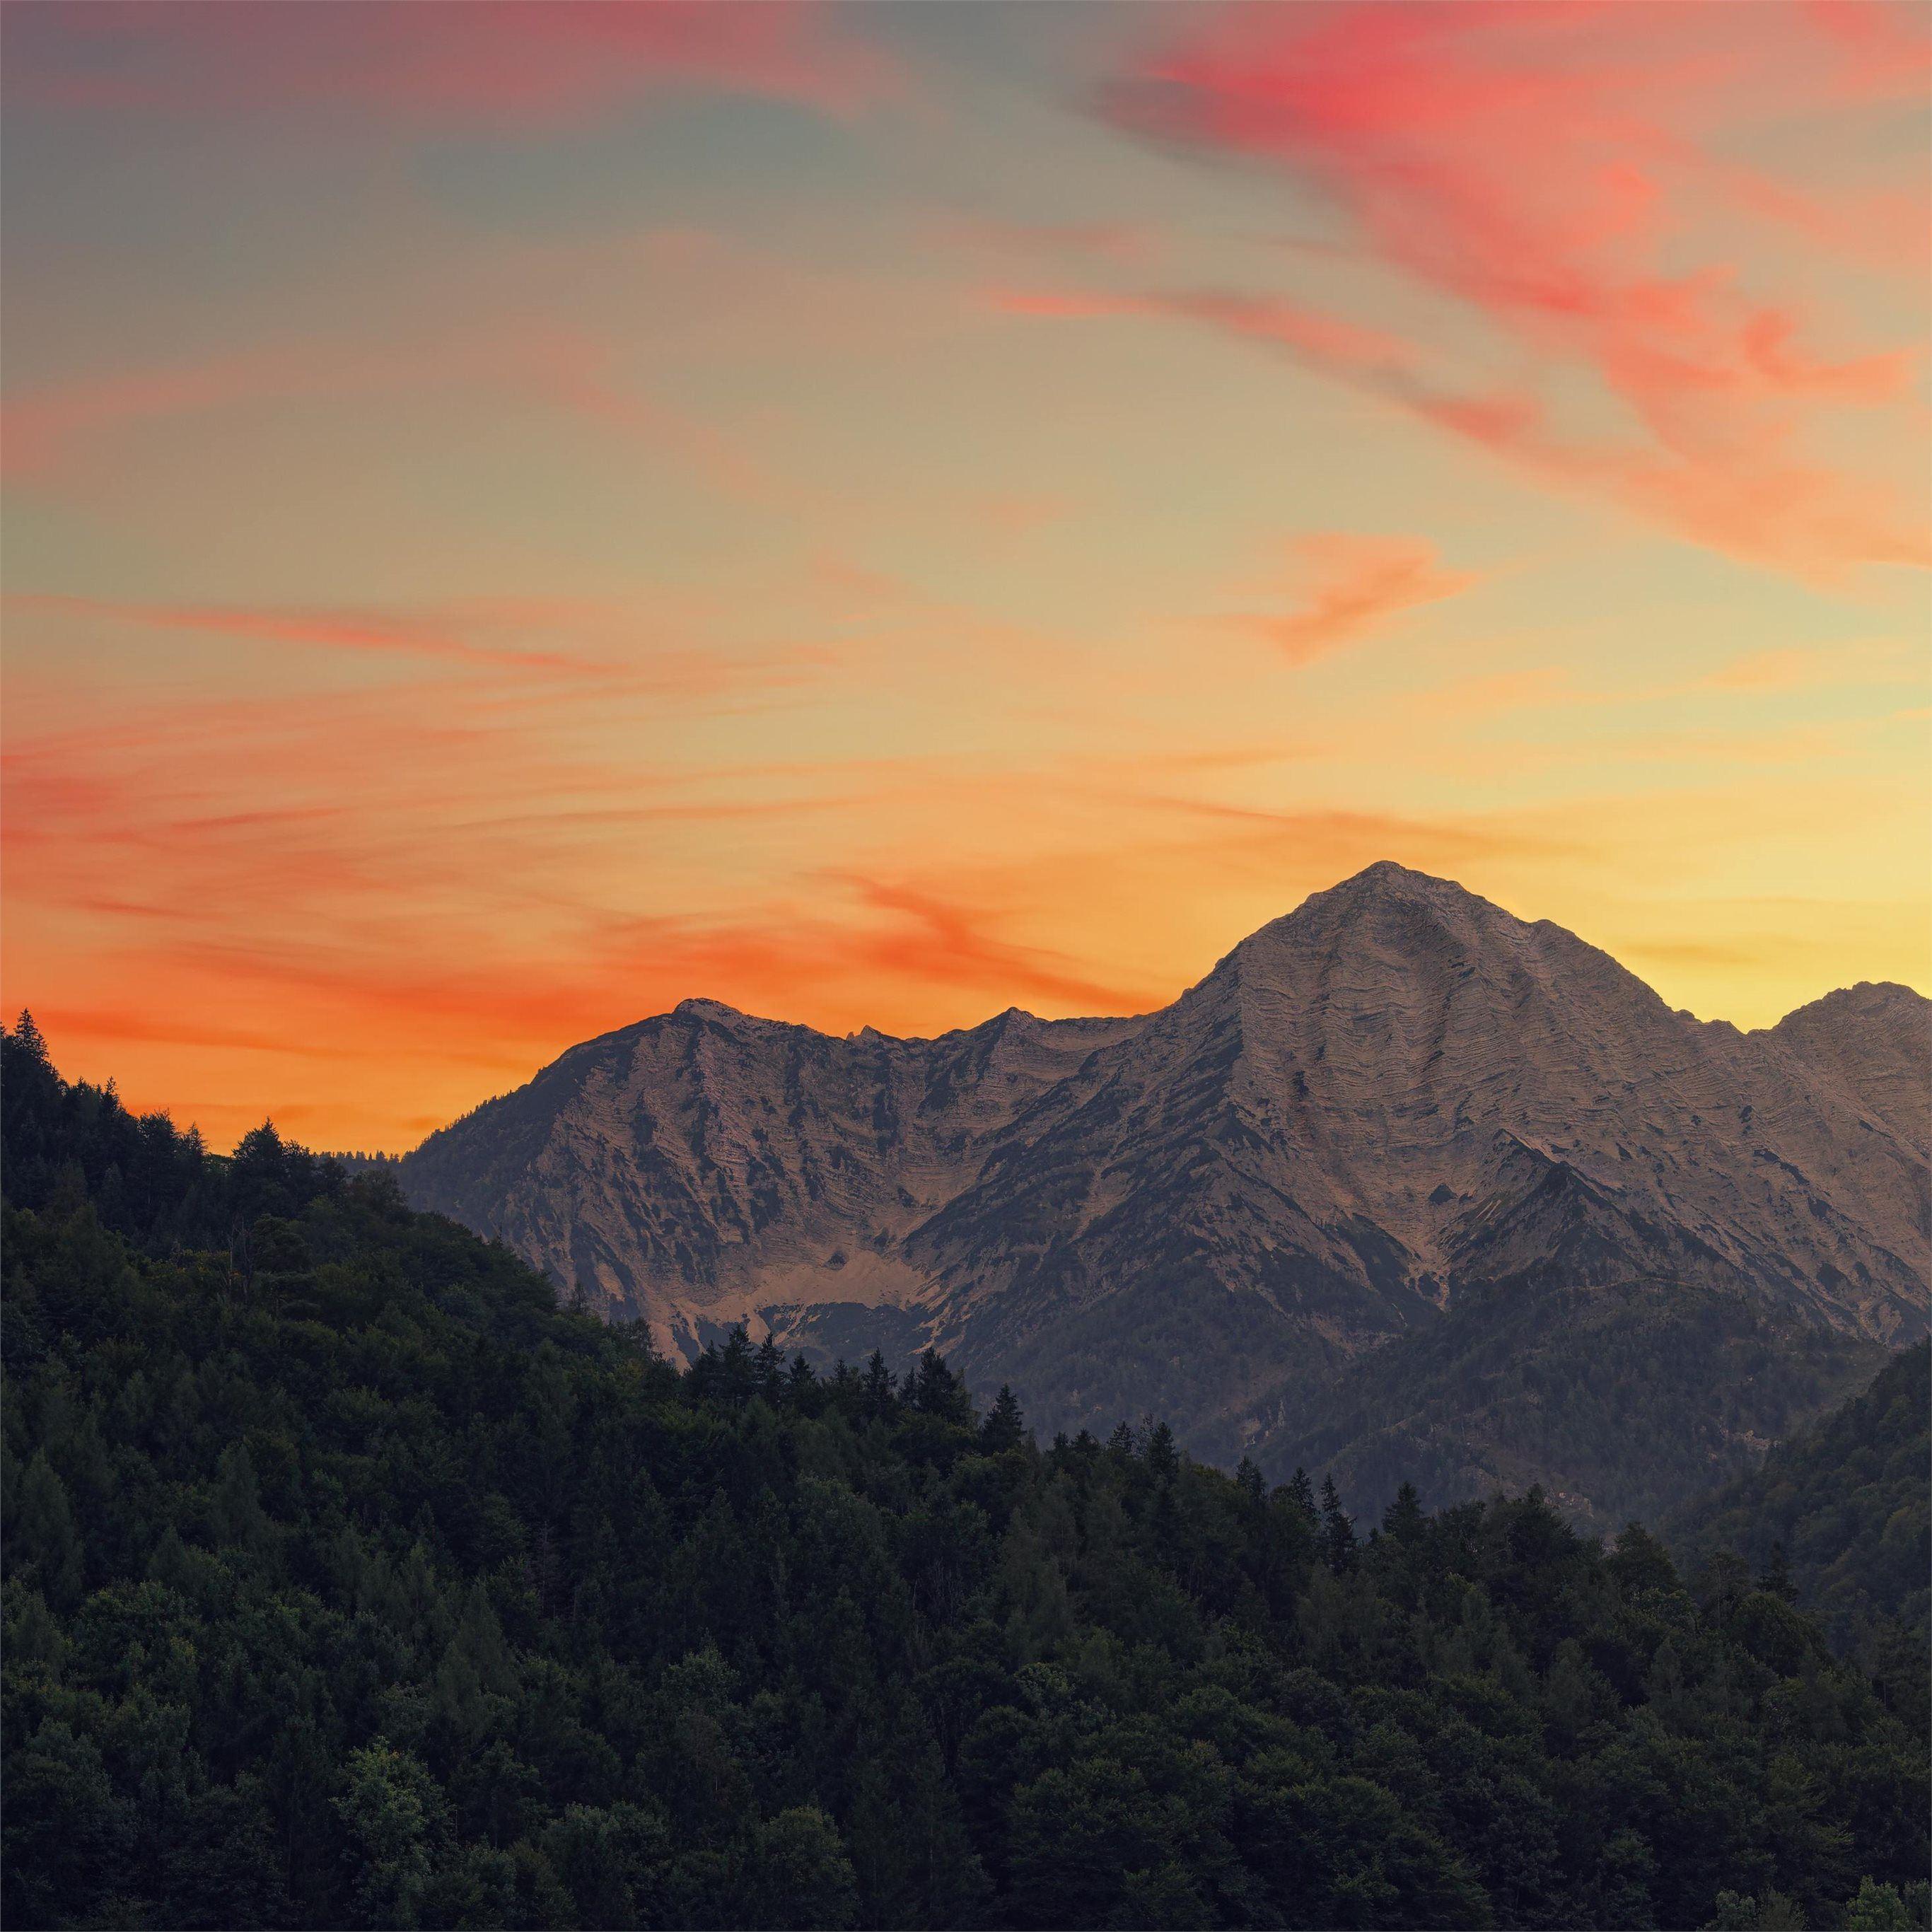 Best Nature Landscape Ipad Pro Wallpapers Free Hd